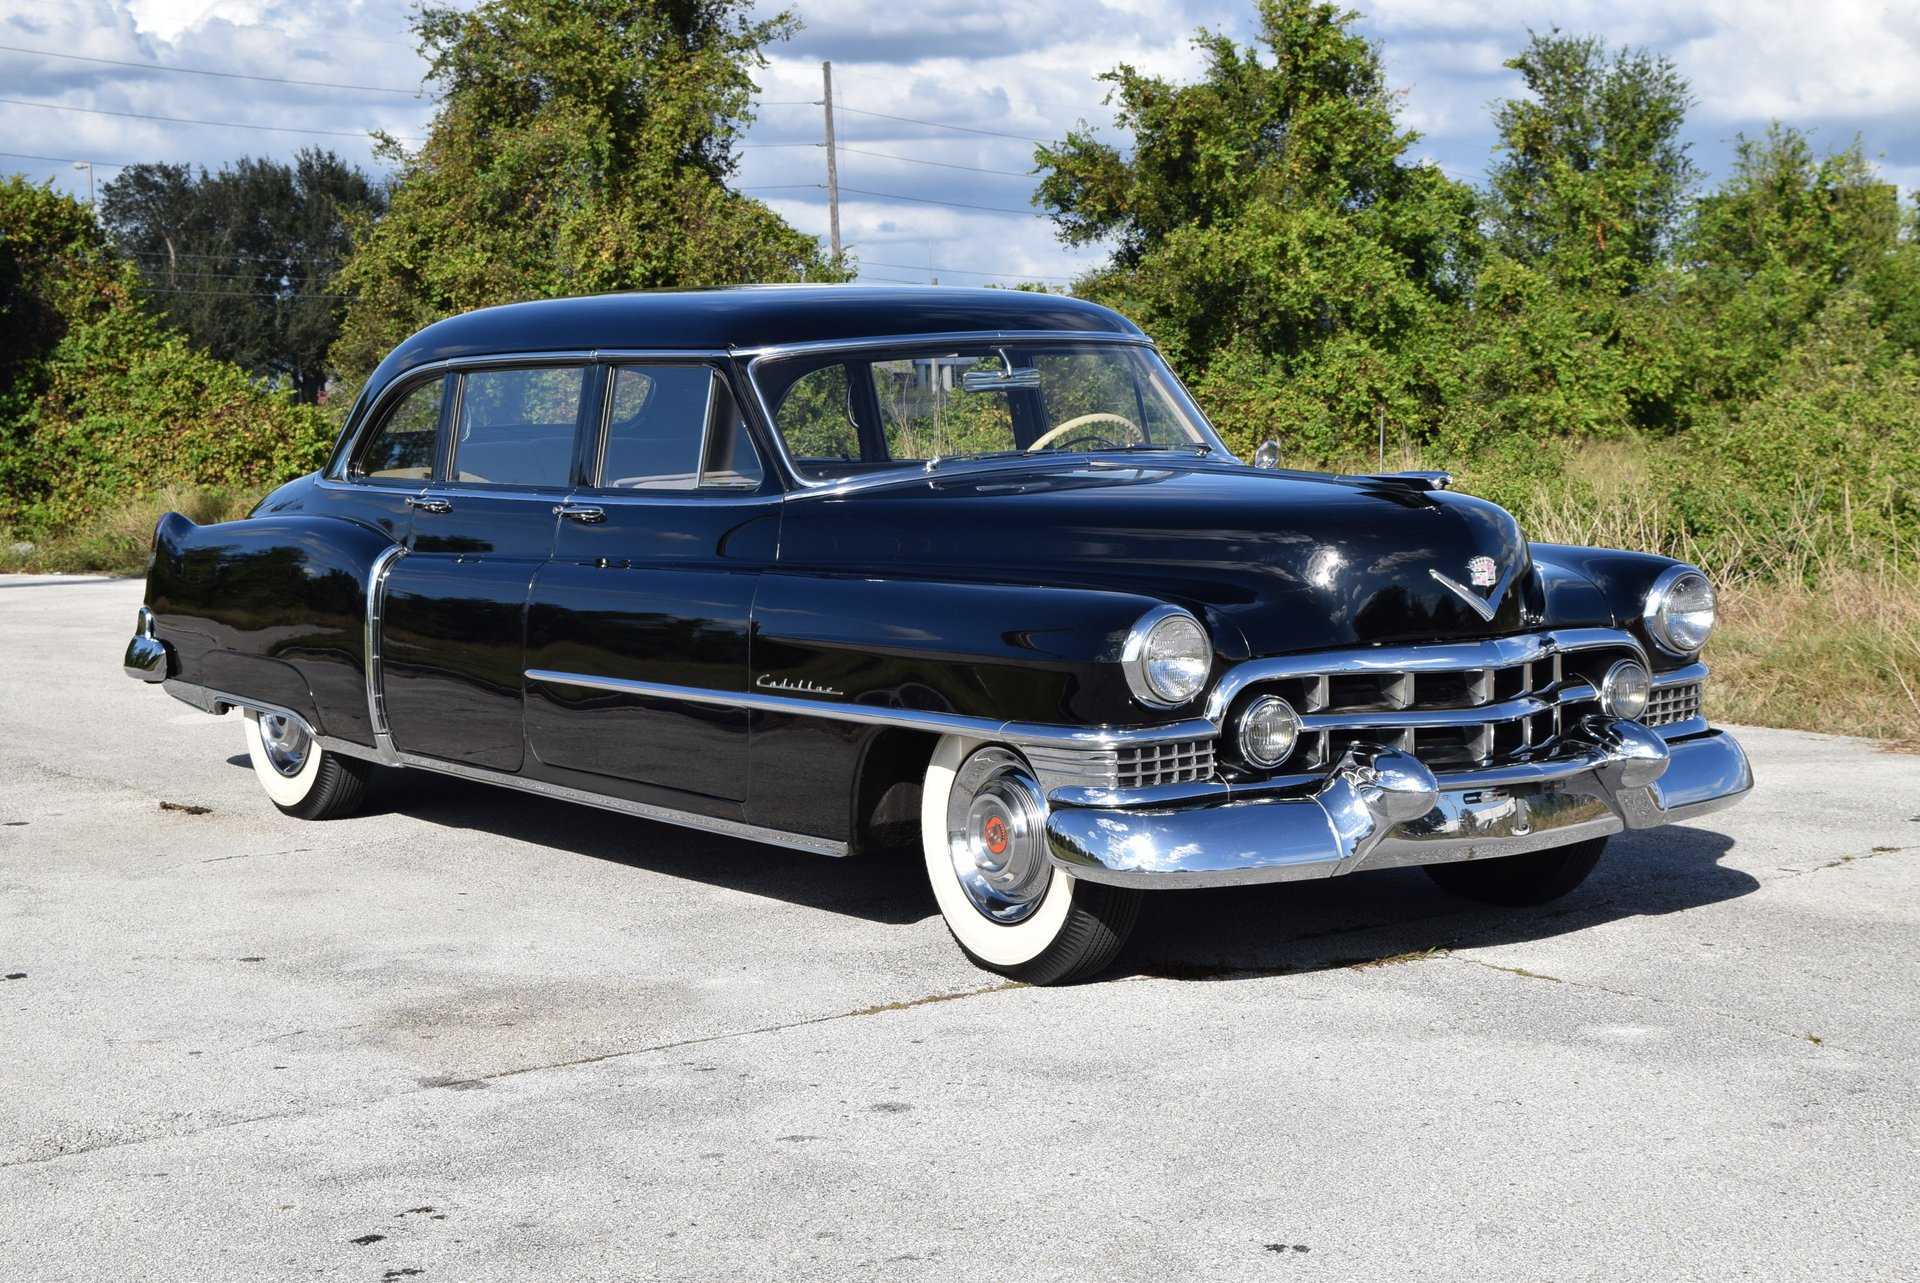 1951 Cadillac Fleetwood 75 Limousine Orlando Classic Cars